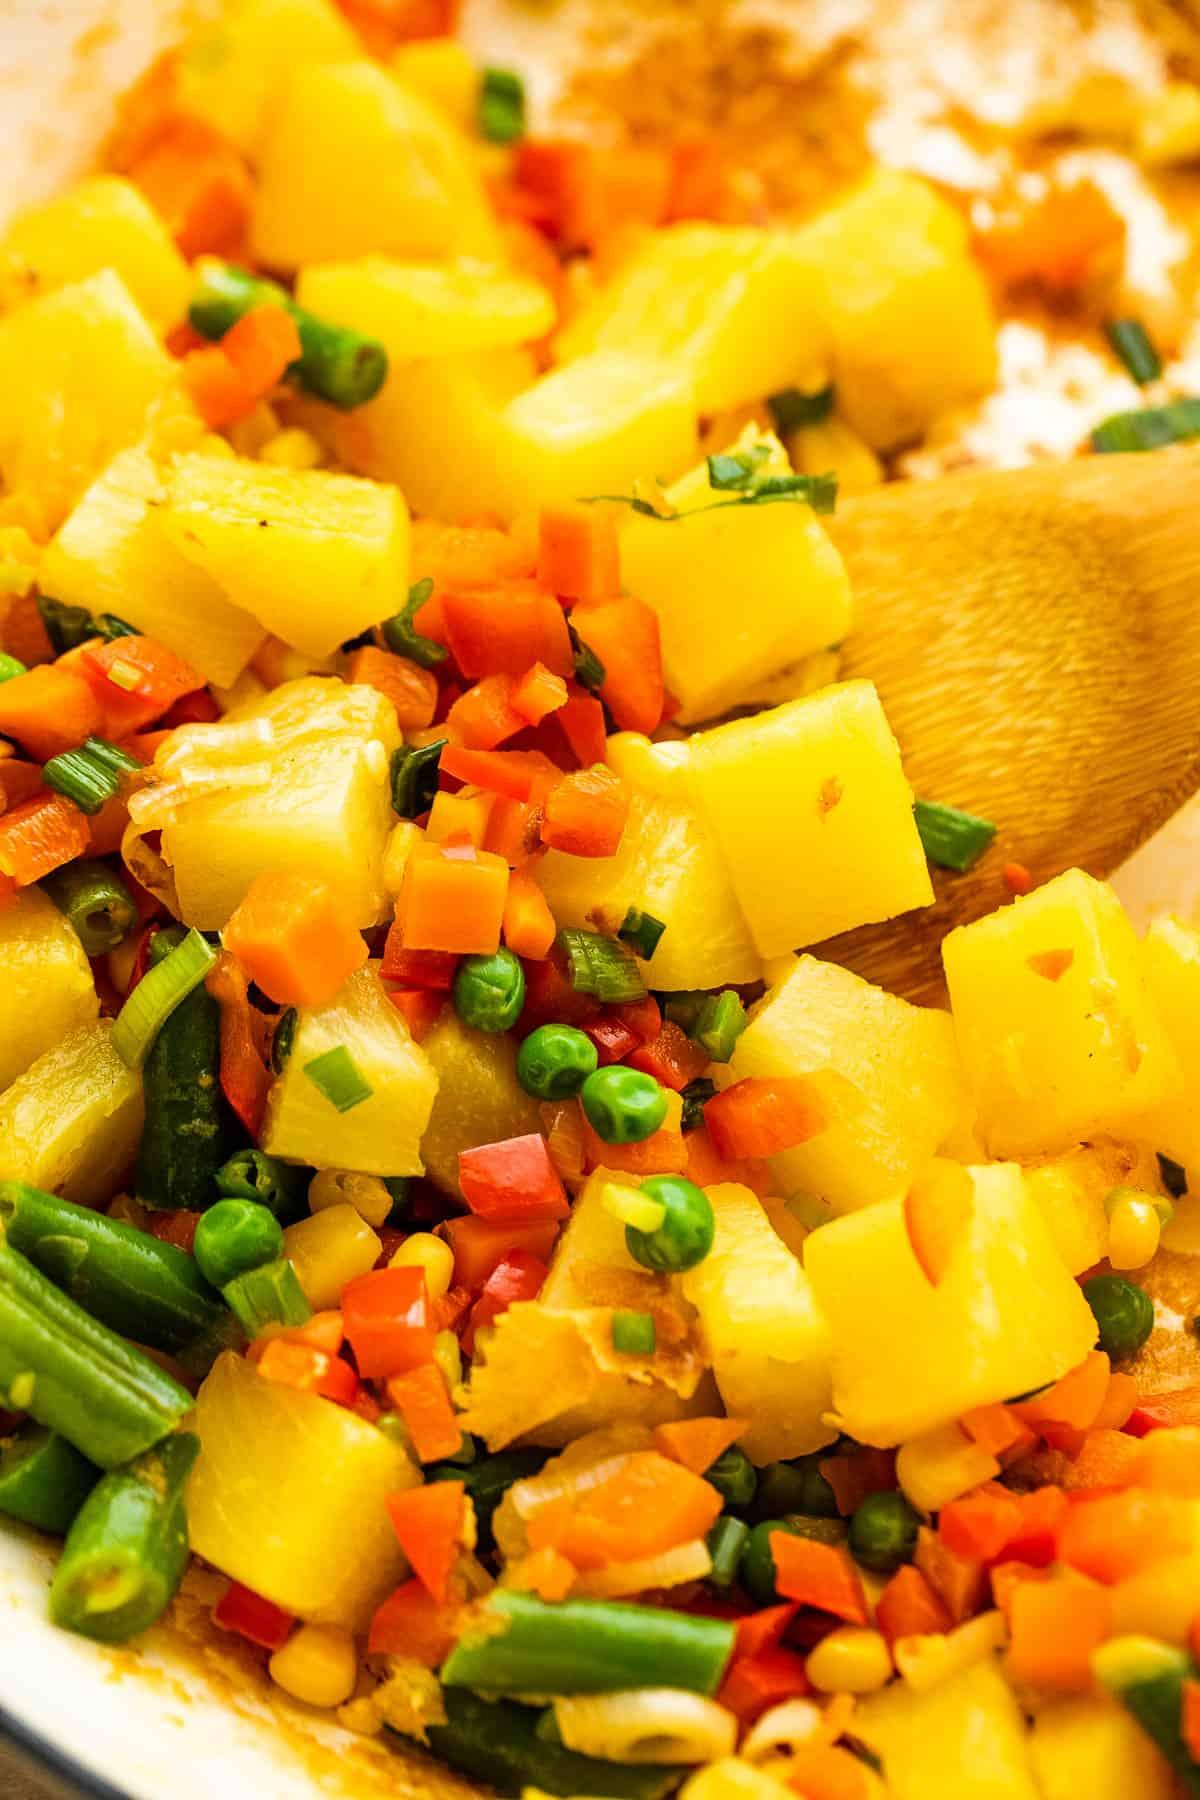 cooking pineapple chunks with veggies